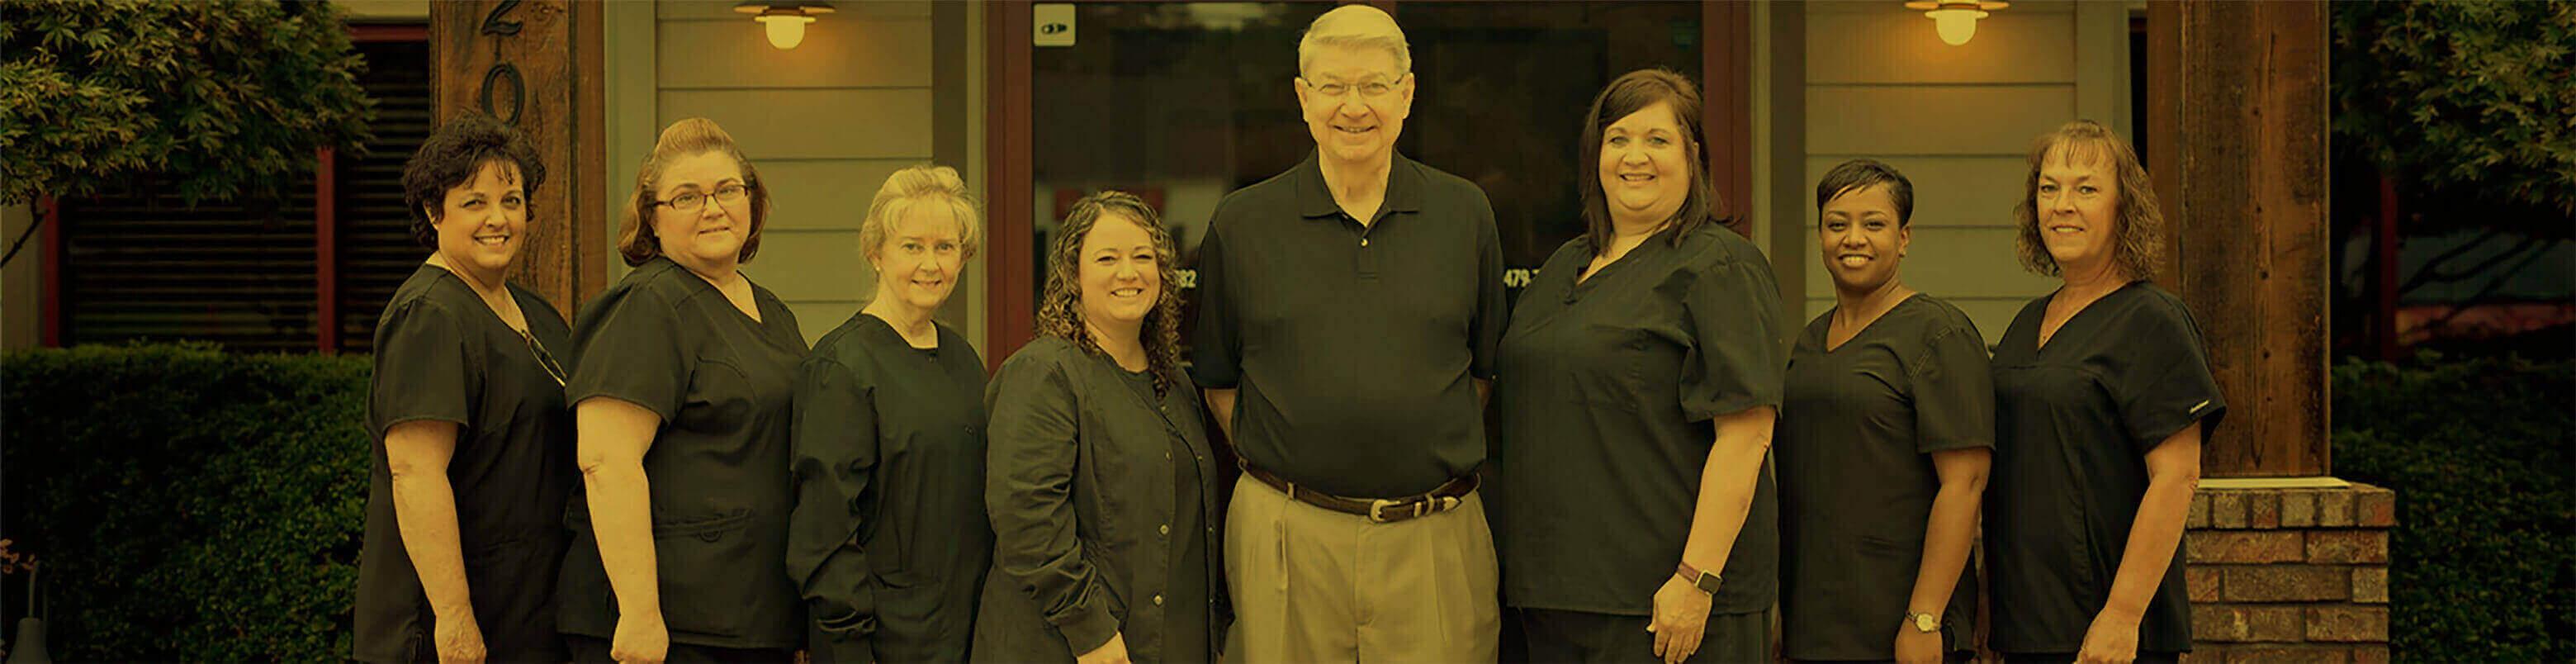 dental team photo in in Fort Smith Arkansas